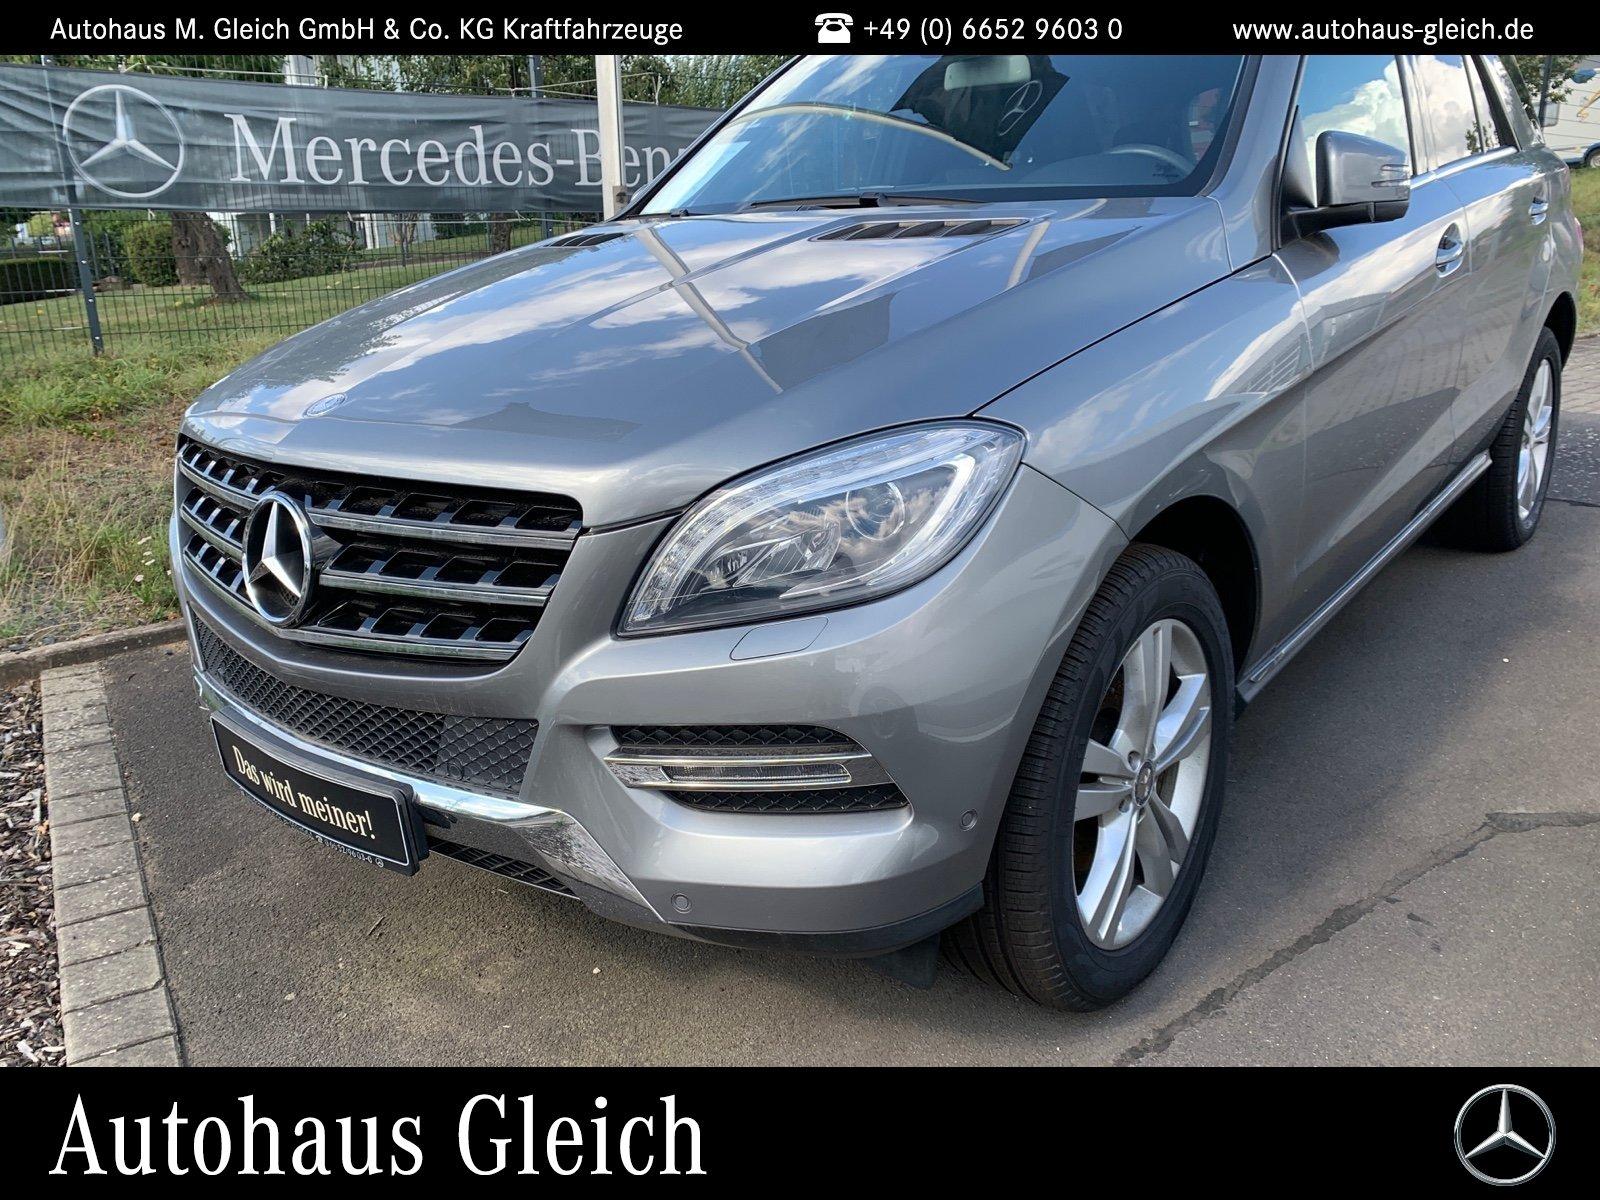 Mercedes-Benz ML 250 BlueTEC 4MATIC Off-Roader Navi/Autom., Jahr 2013, Diesel